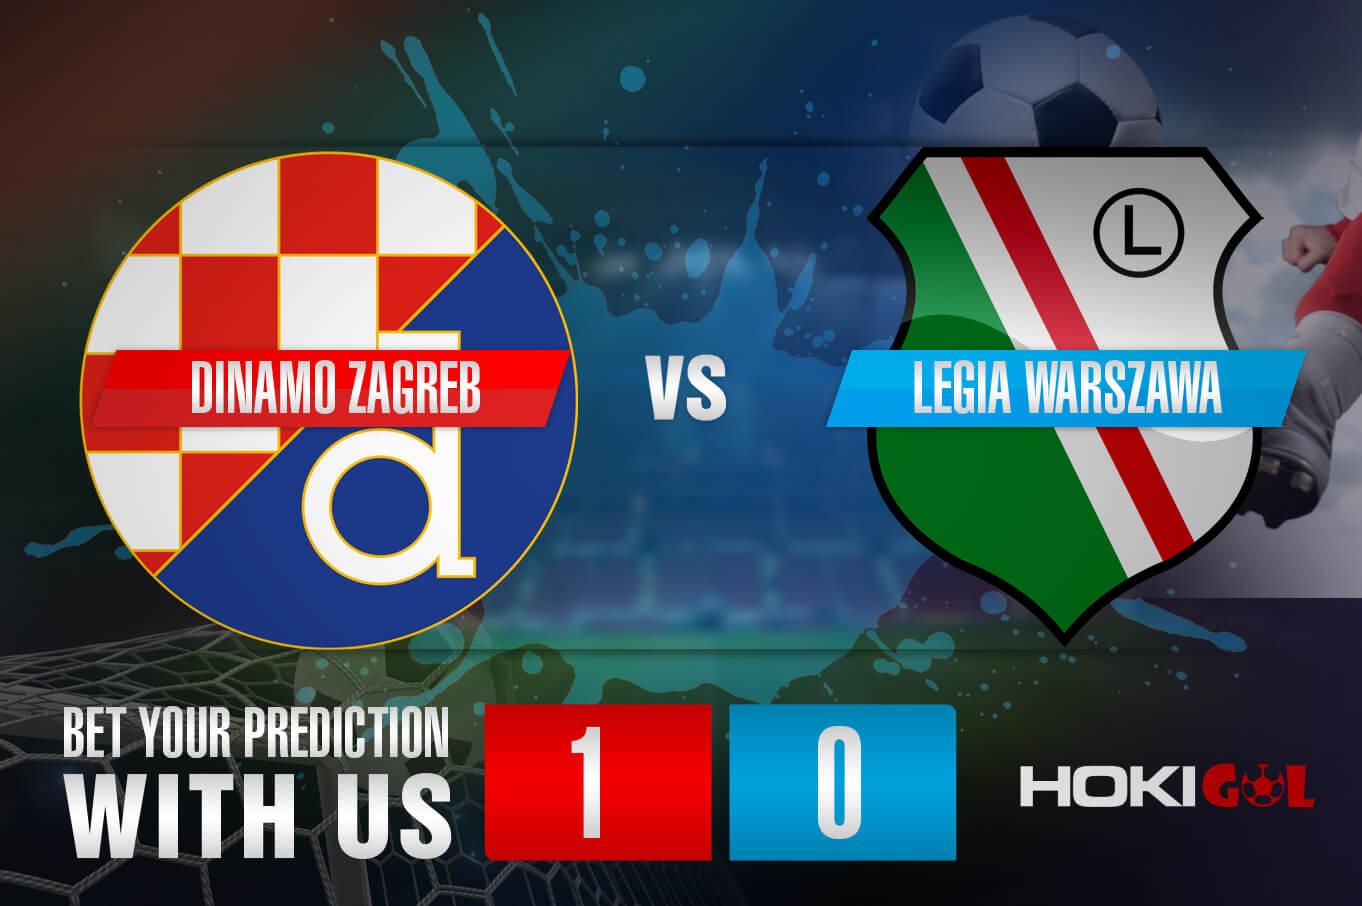 Prediksi Bola Dinamo Zagreb Vs Legia Warszawa 5 Agustus 2021